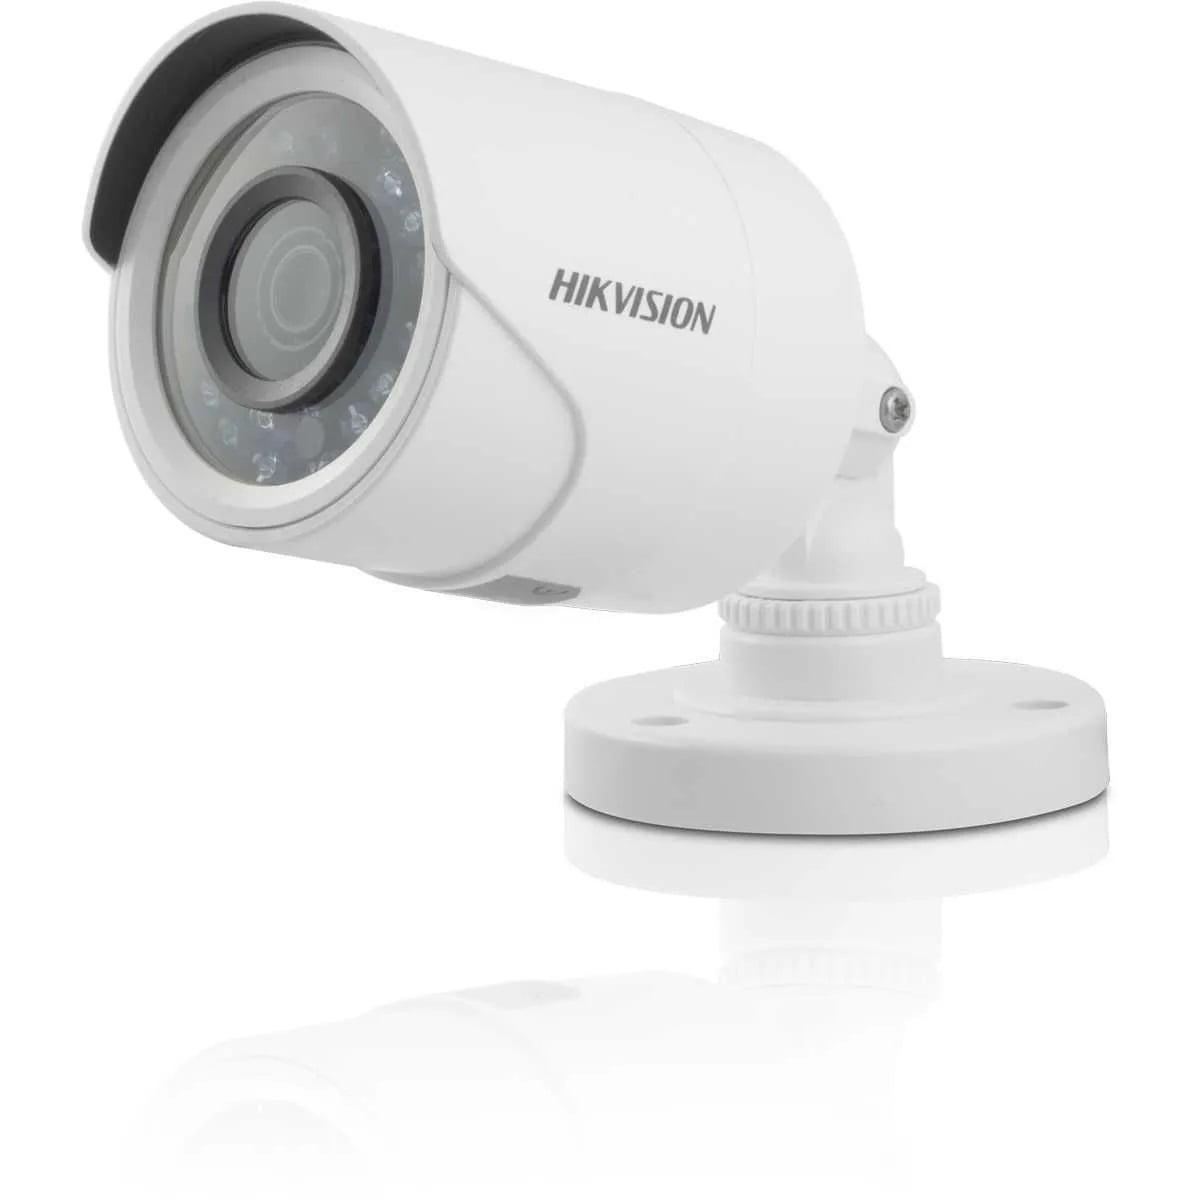 Câmera Hikvision DS-2CE16DOT-IRPF de segurança e infra vermelho 2MP Full HD 1080p Turbo HD Bullet 20 metros lente 2.8mm